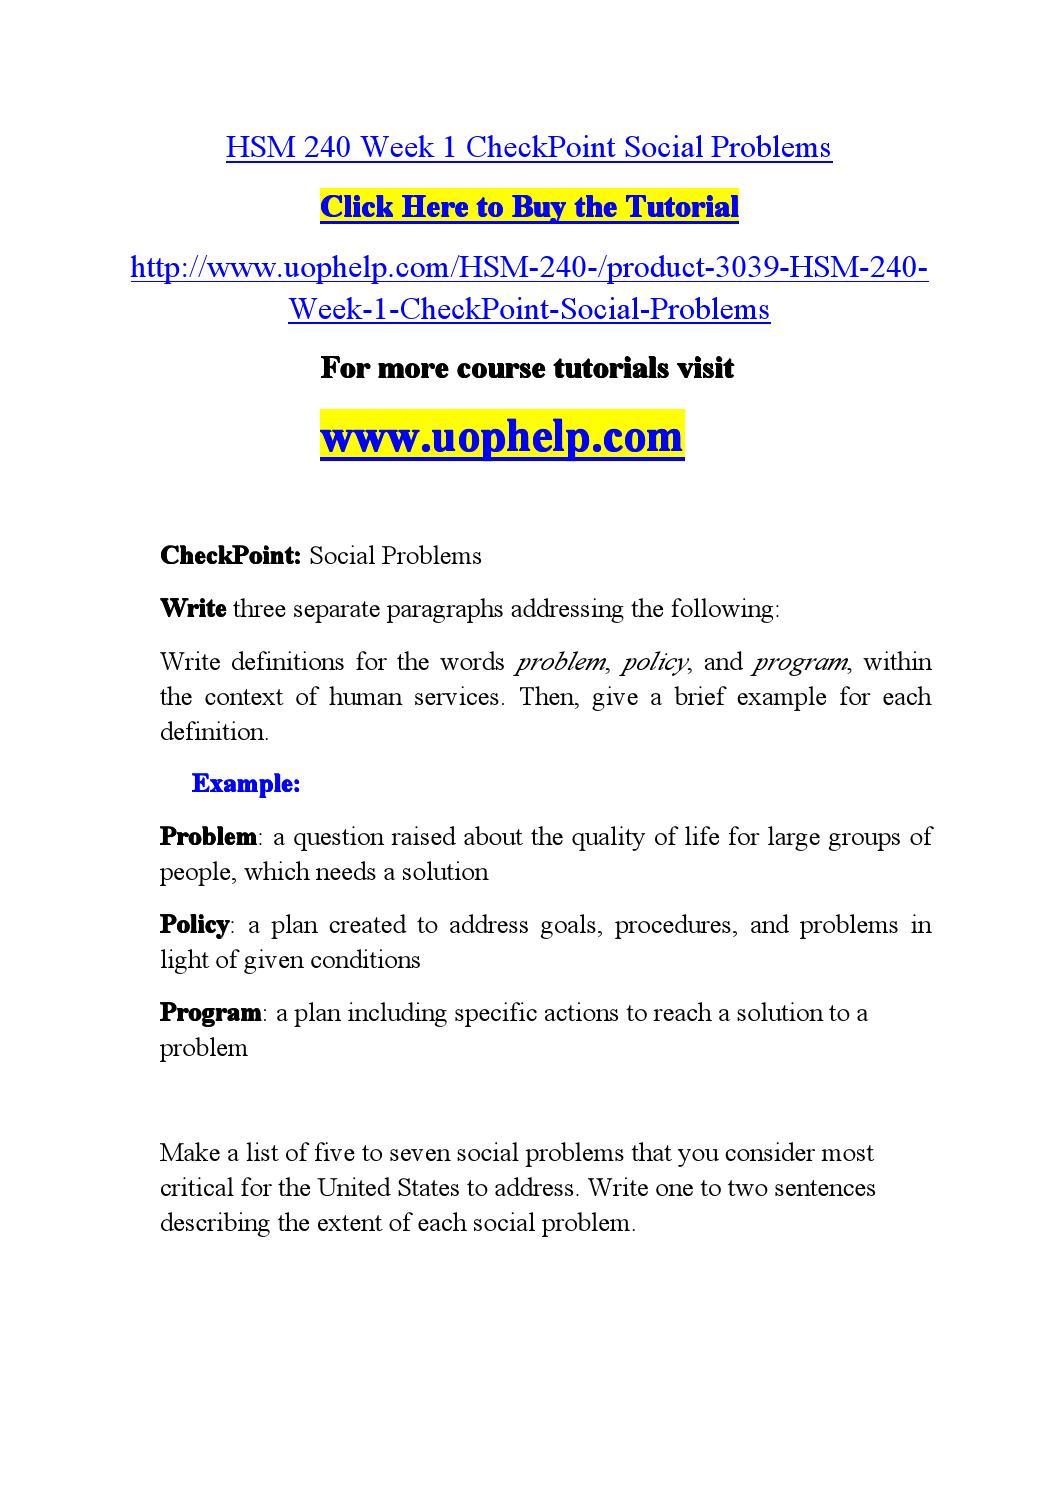 hsm 240 week 1 checkpoint social problems by mjjj773 - issuu